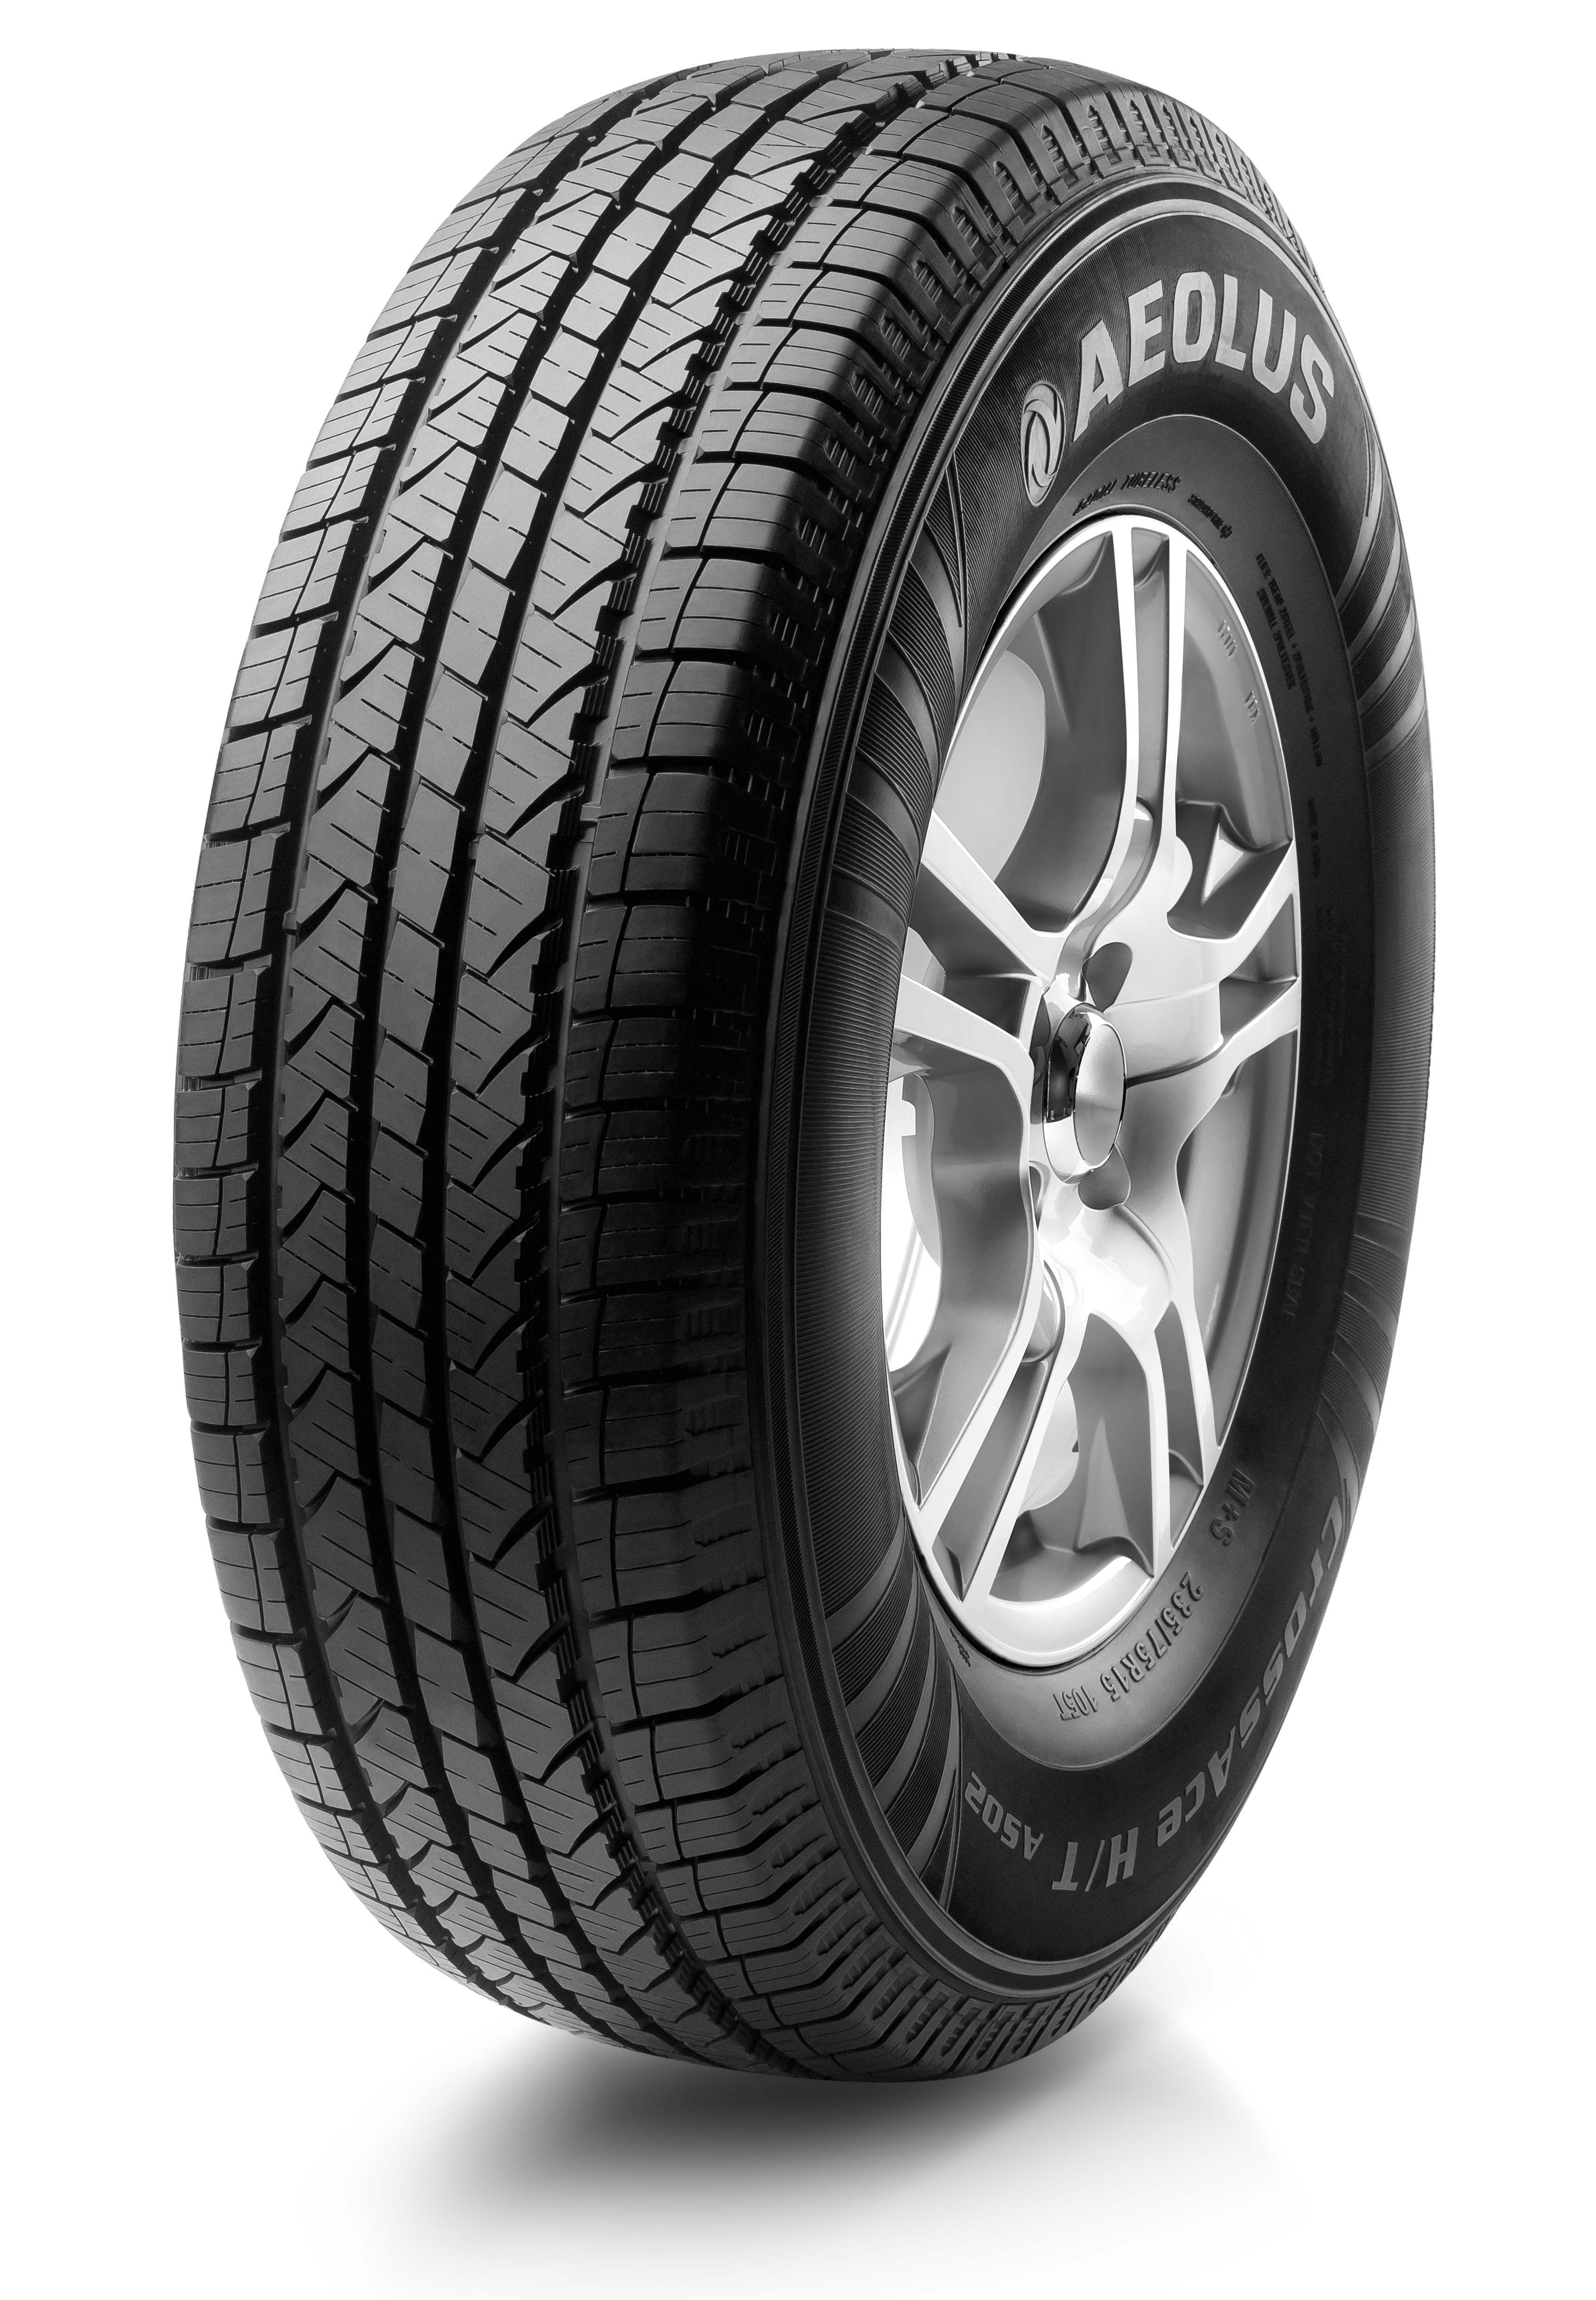 The new Aeolus Crossace SUV tyre